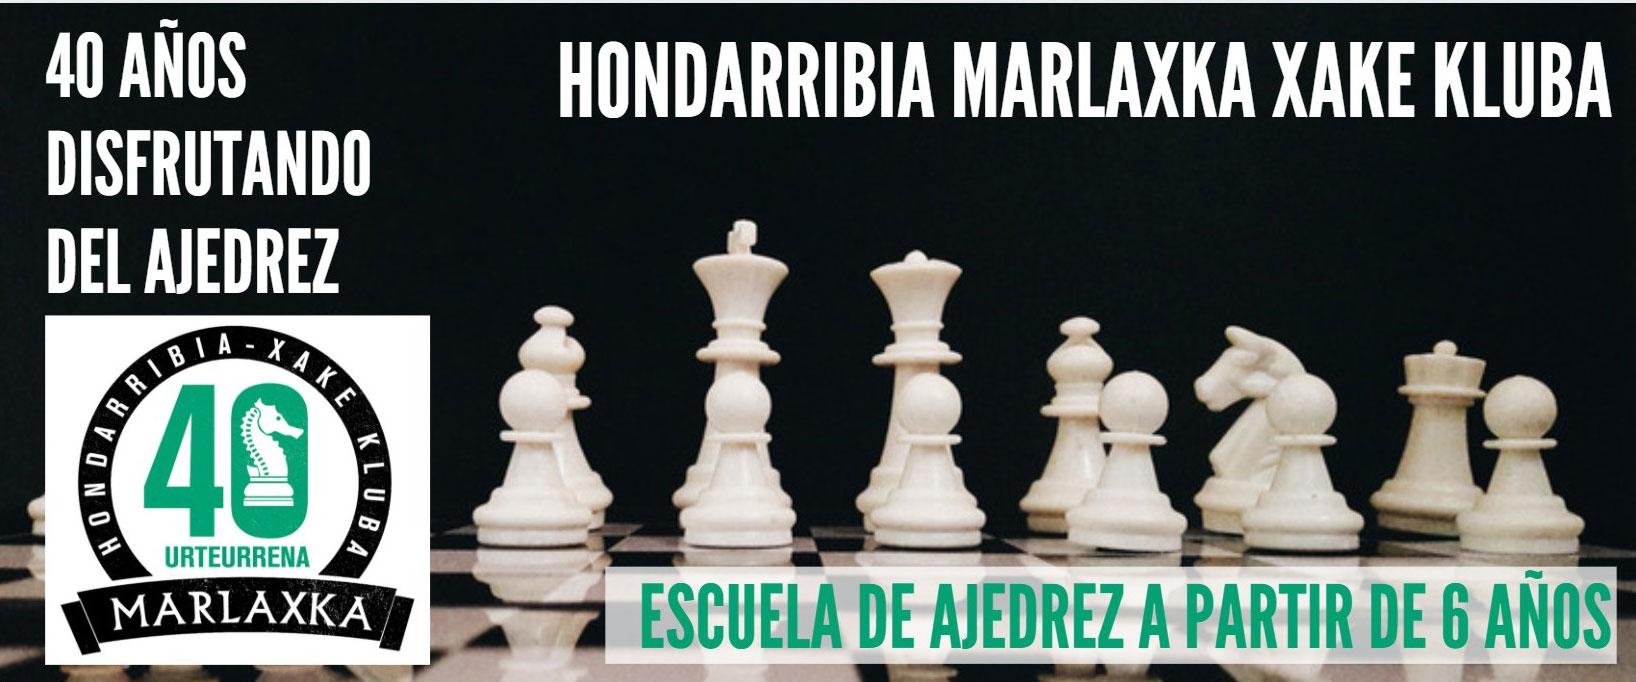 marlaxka_xake_ajedrez_hondarribia